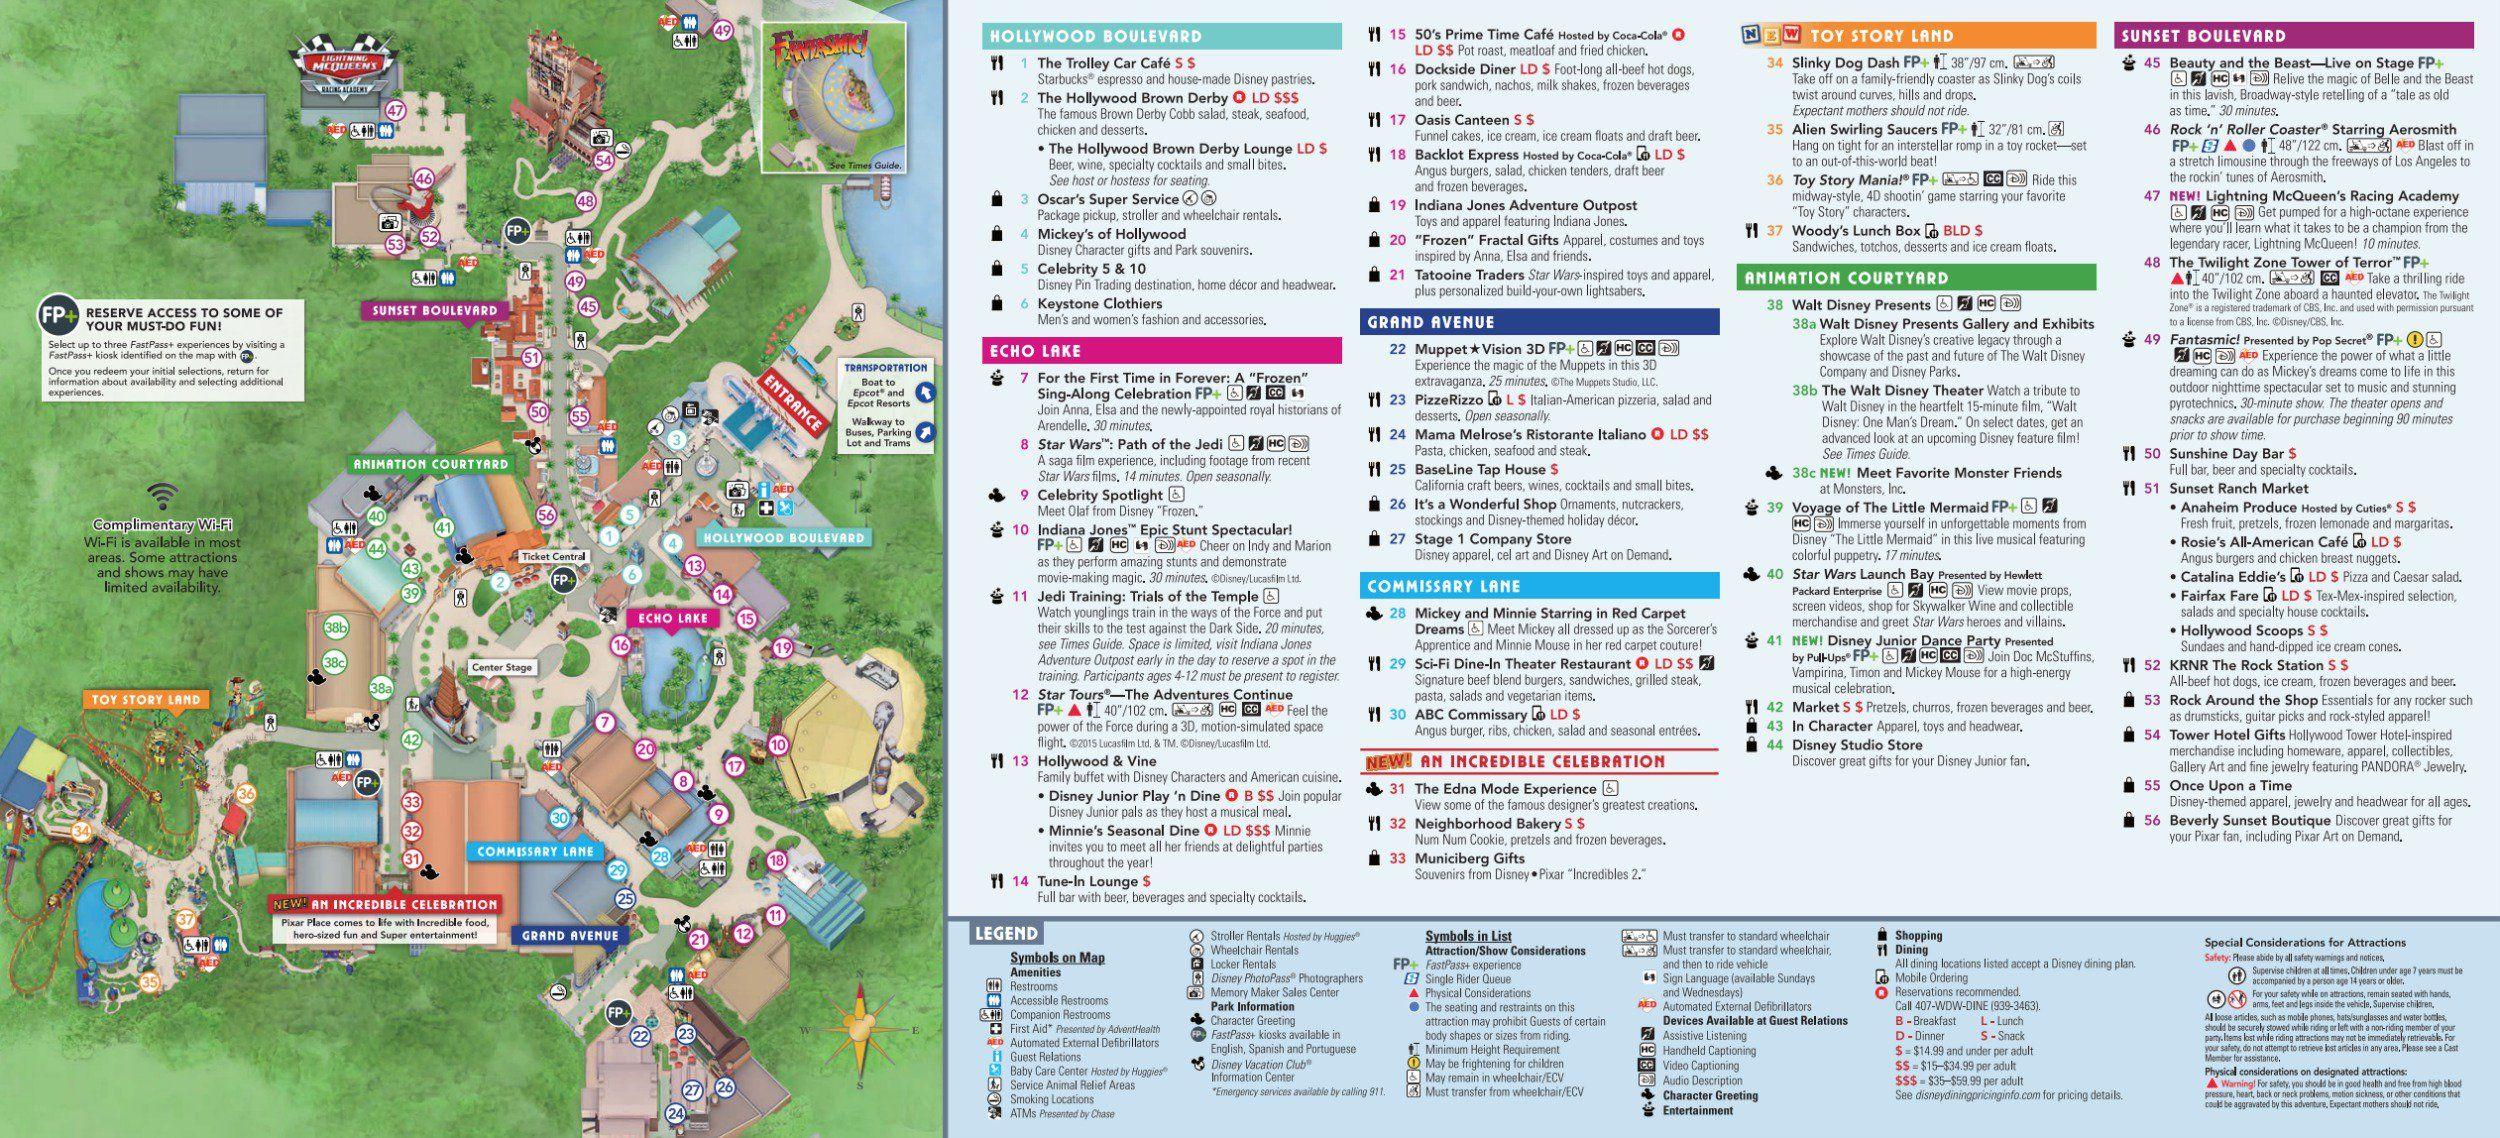 Disney\'s Hollywood Studios Map at Walt Disney World ...